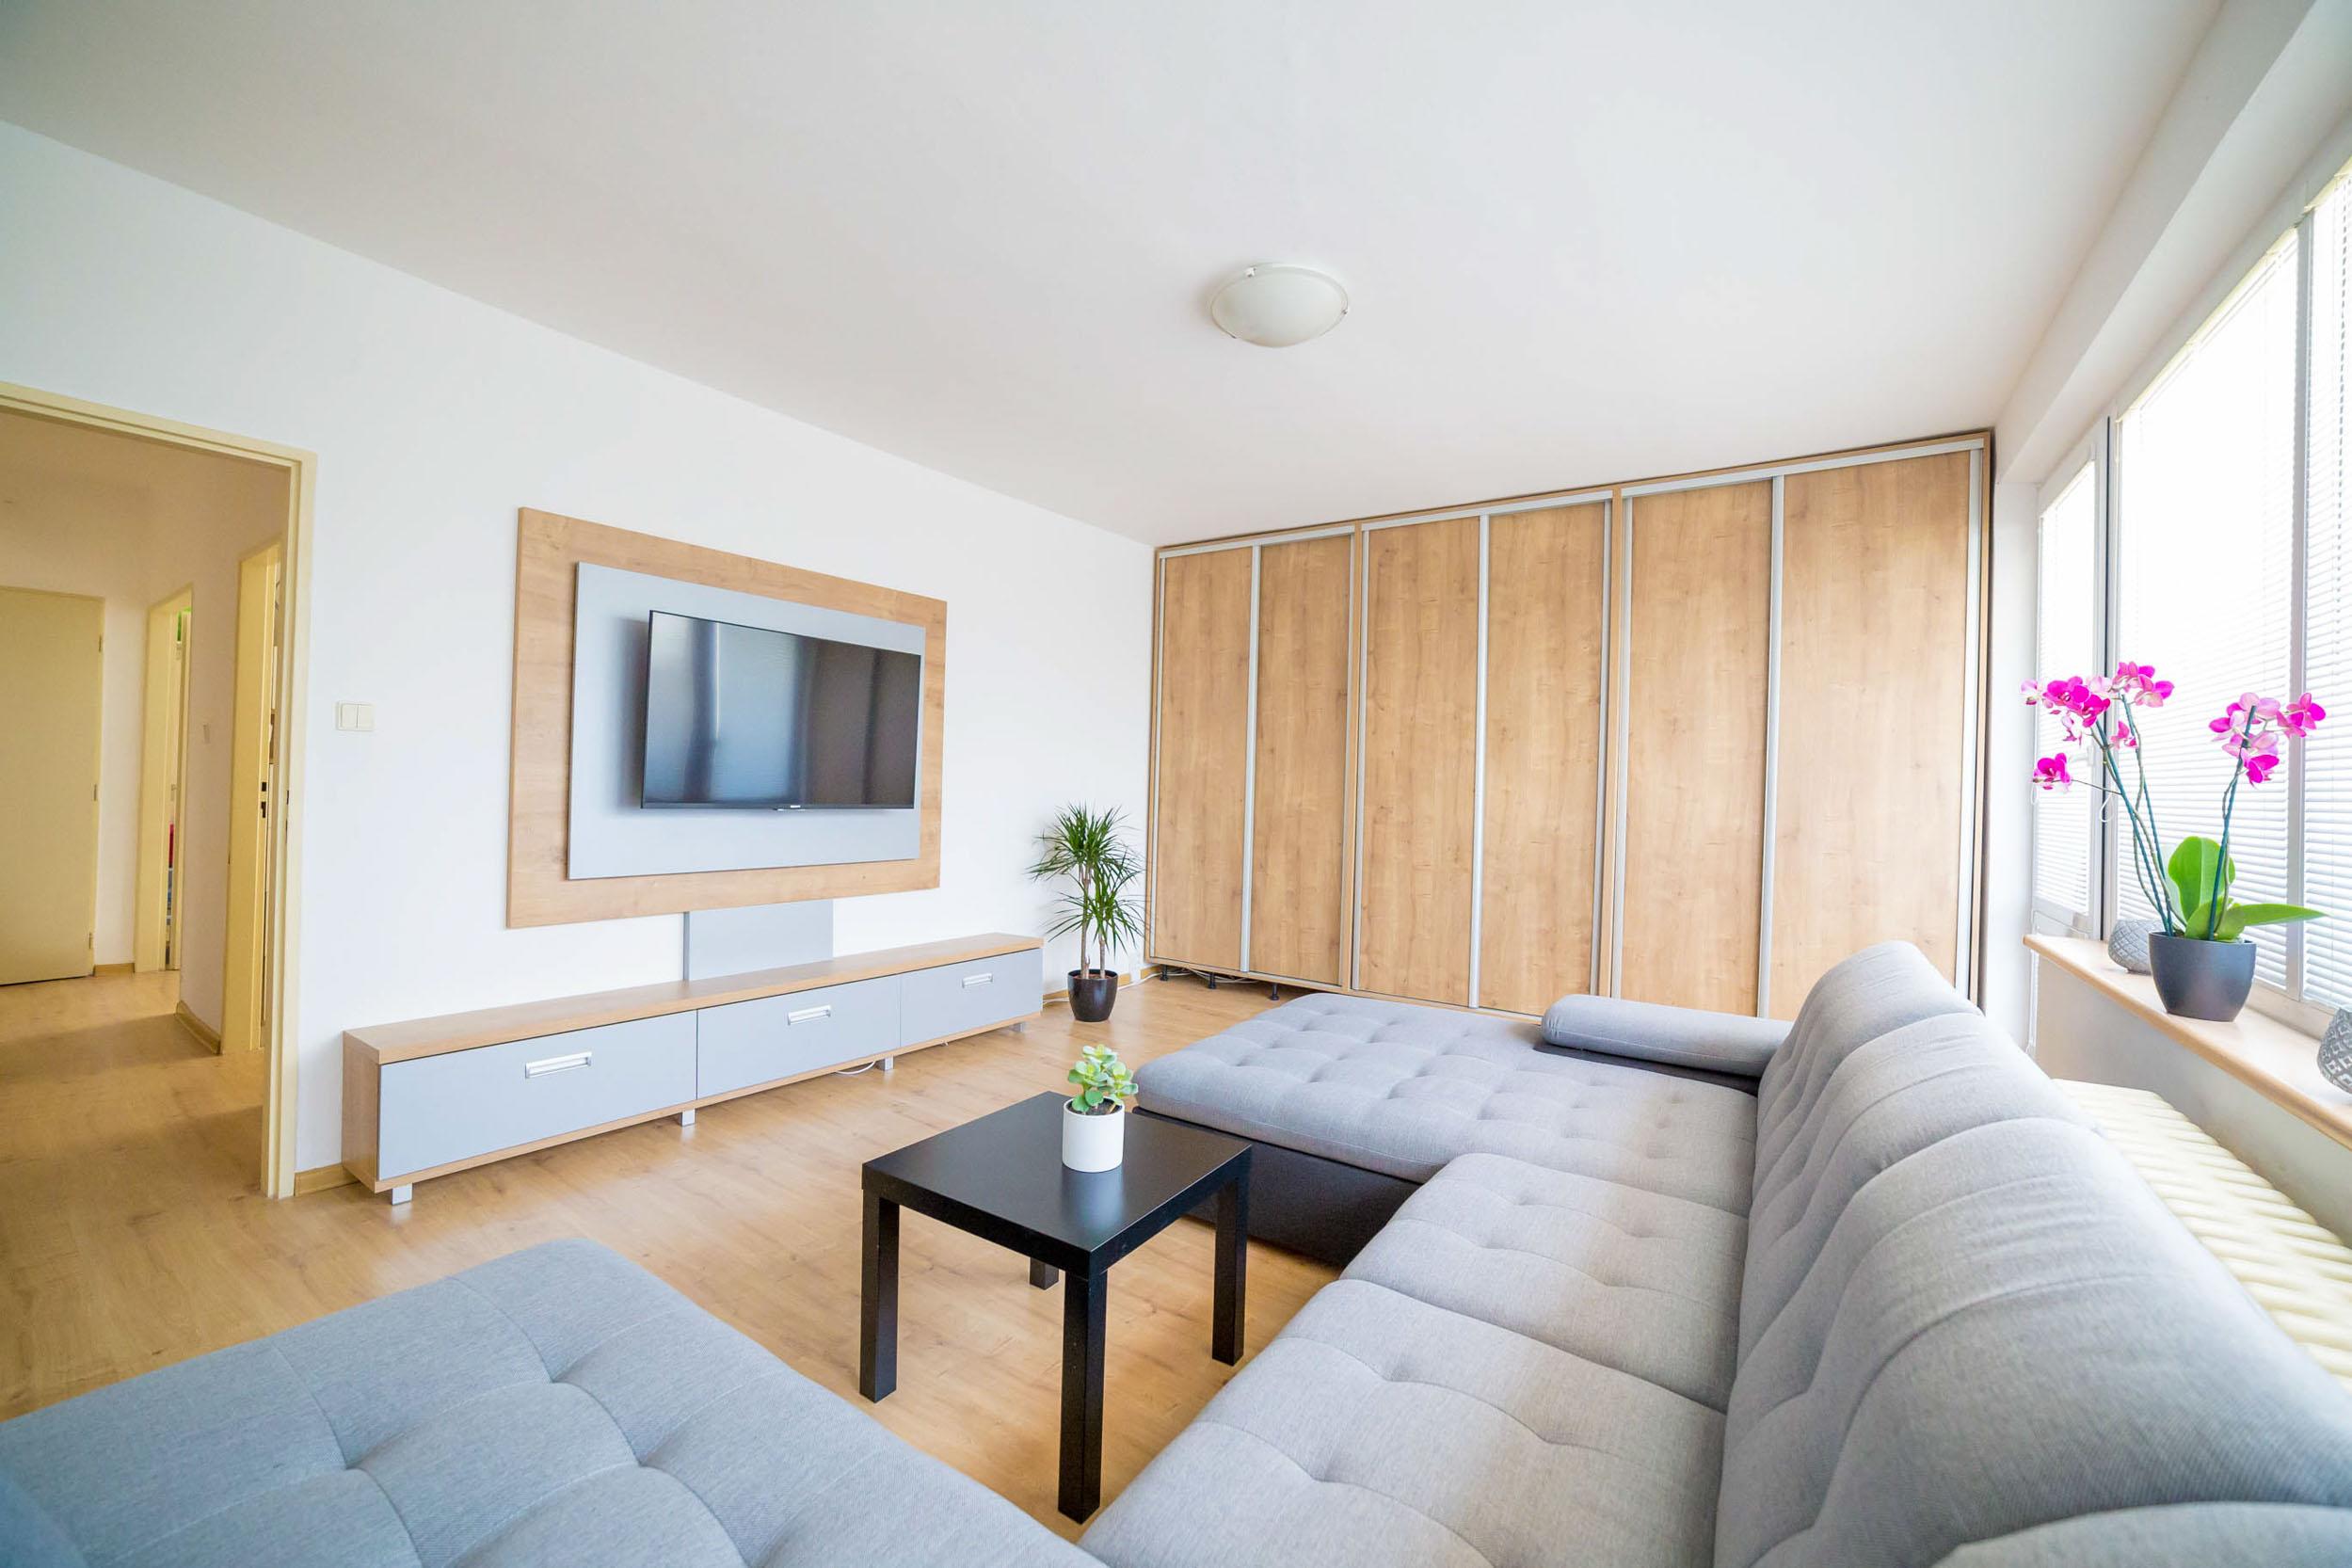 opava reality orchidej kvetina vestavna skrin stul televize sedacka svetlo dvere radiator okno zaluzie